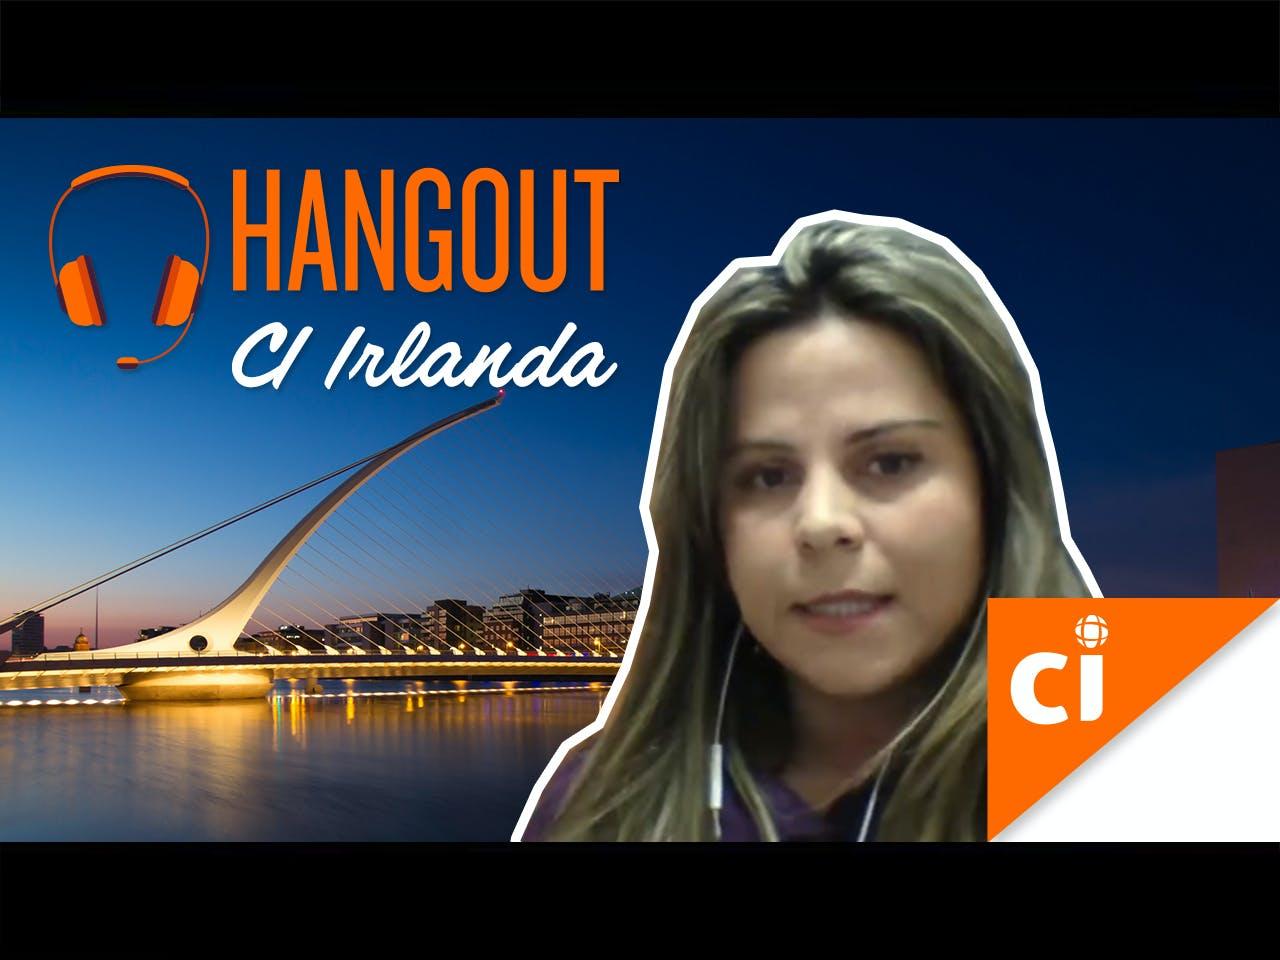 Hangout | CI Irlanda